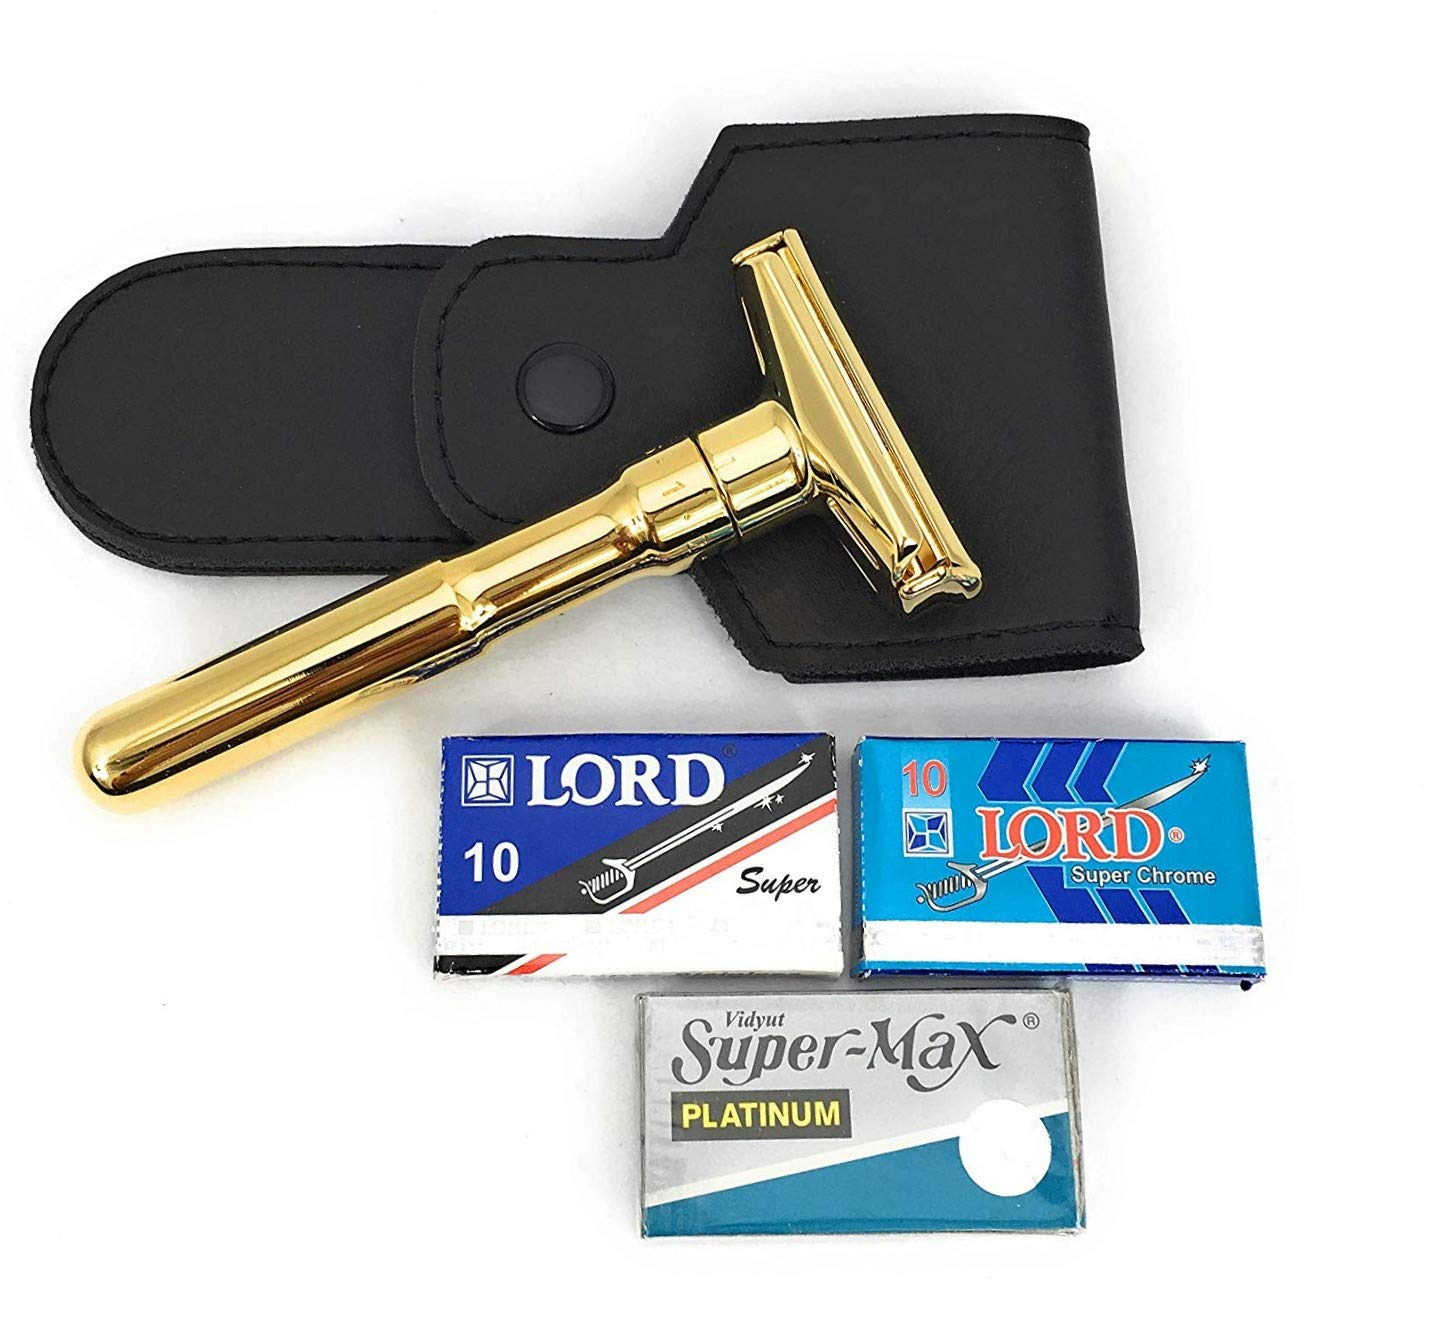 228f5a1e900 Amazon.com  Merkur Gold 702G Futur Double Edge Safety Razor with GBS  leather case